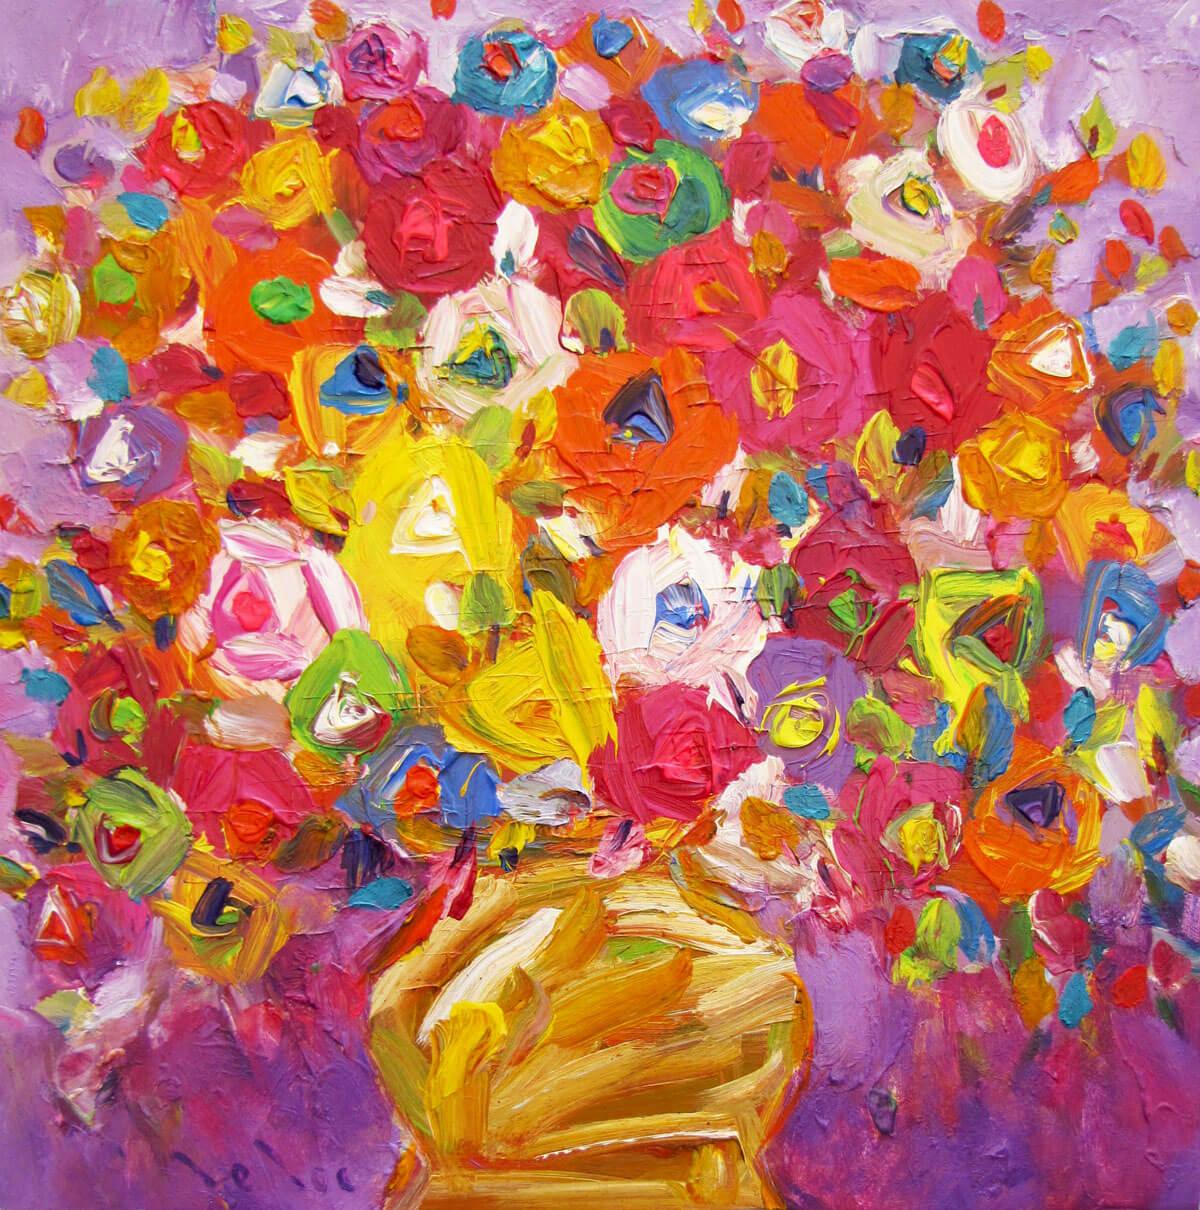 Still-life-with-vase-of-flowers-04-Original-Vietnamese-Art